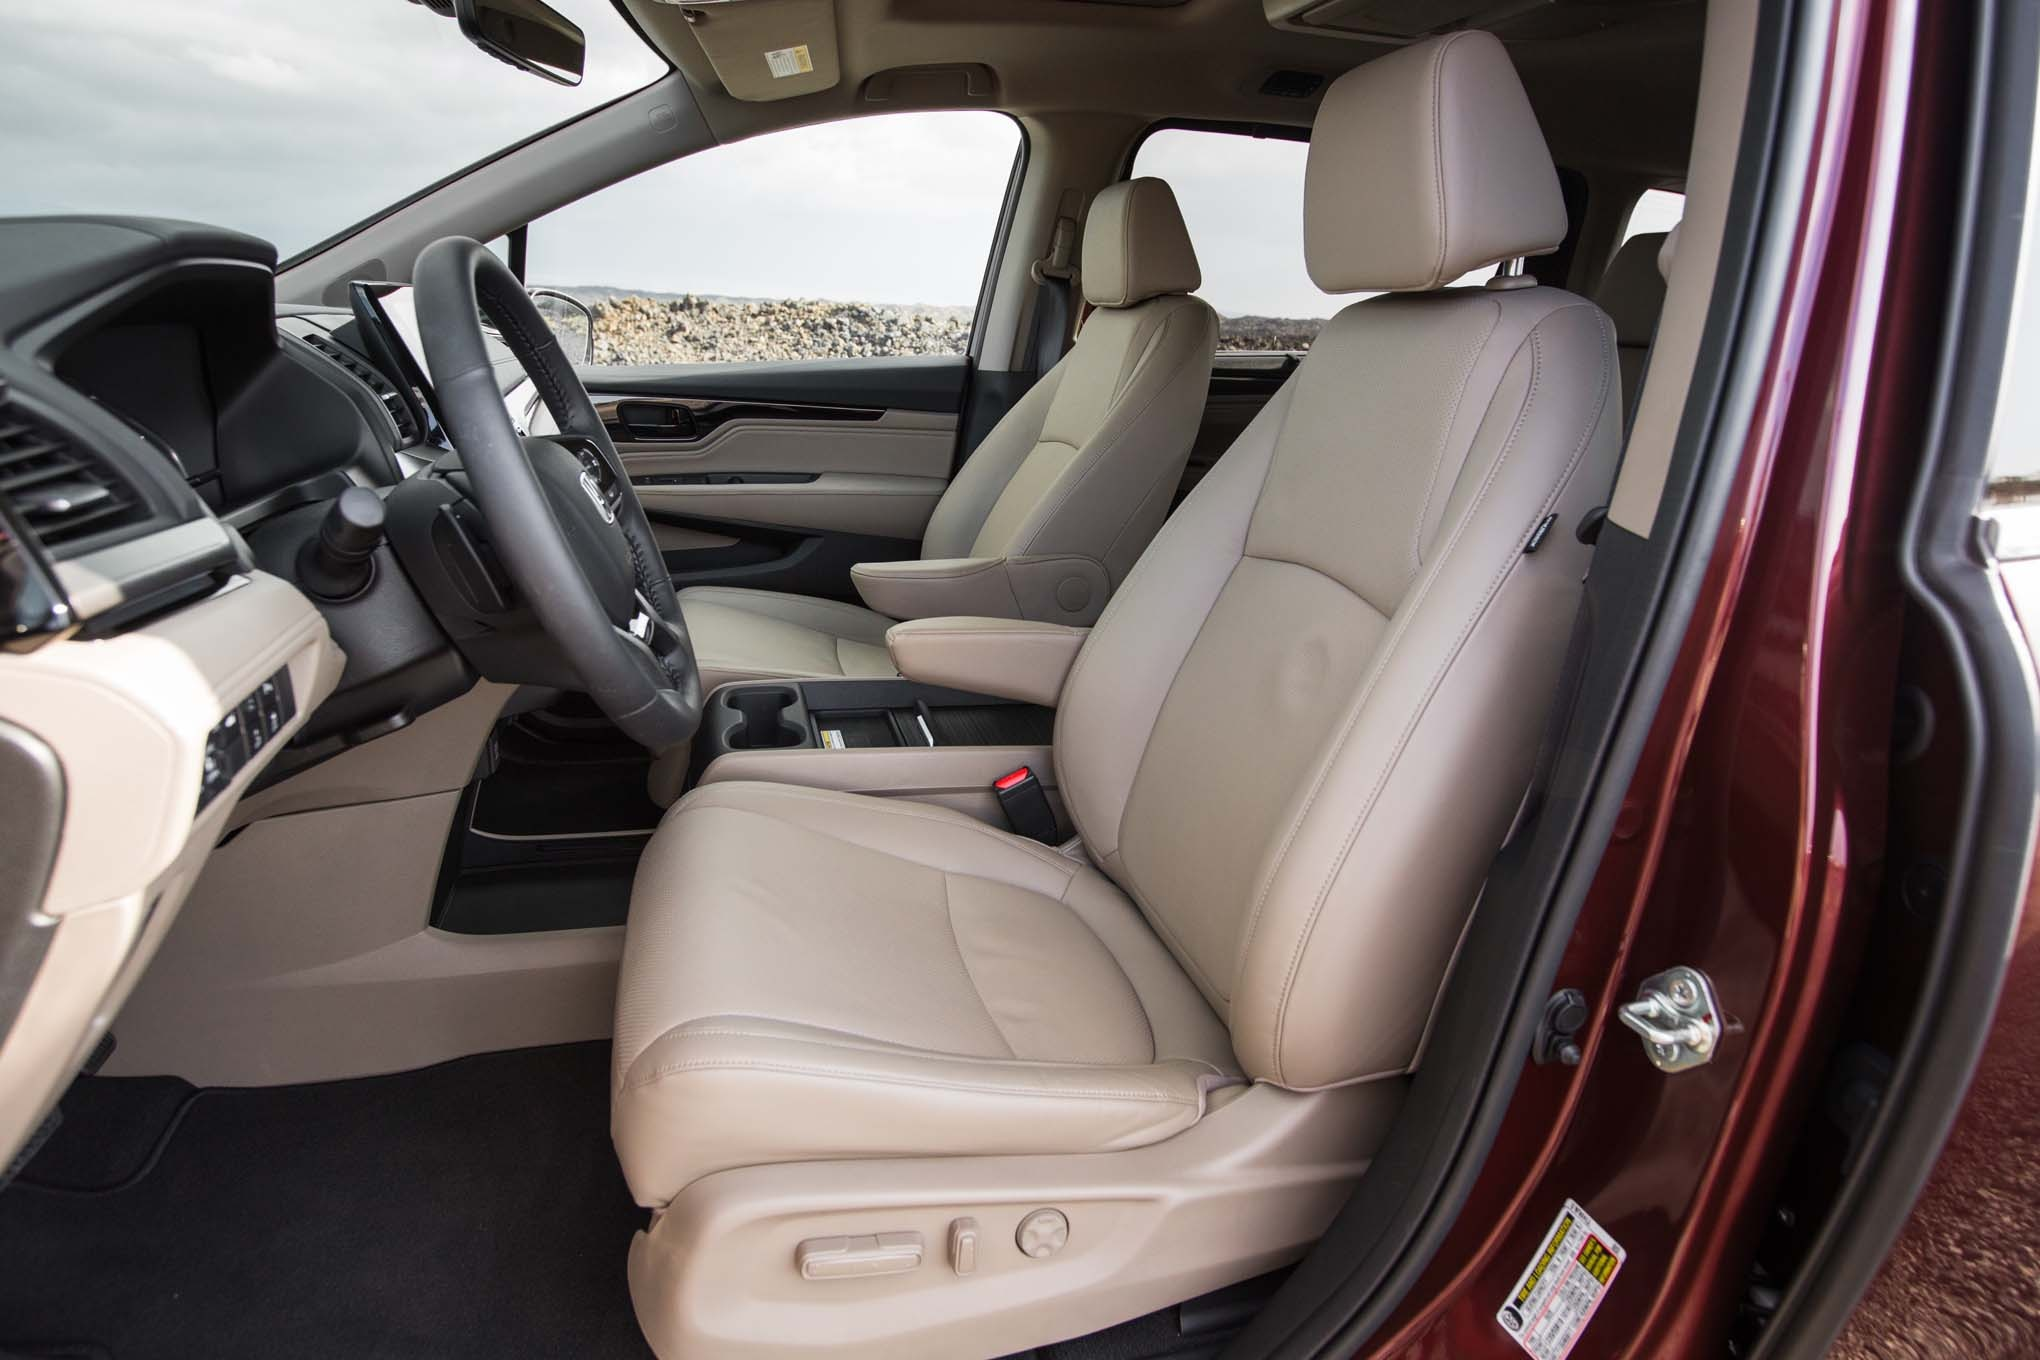 2018 honda odyssey priced from 30 890 automobile magazine for Honda odyssey 2018 mocha interior